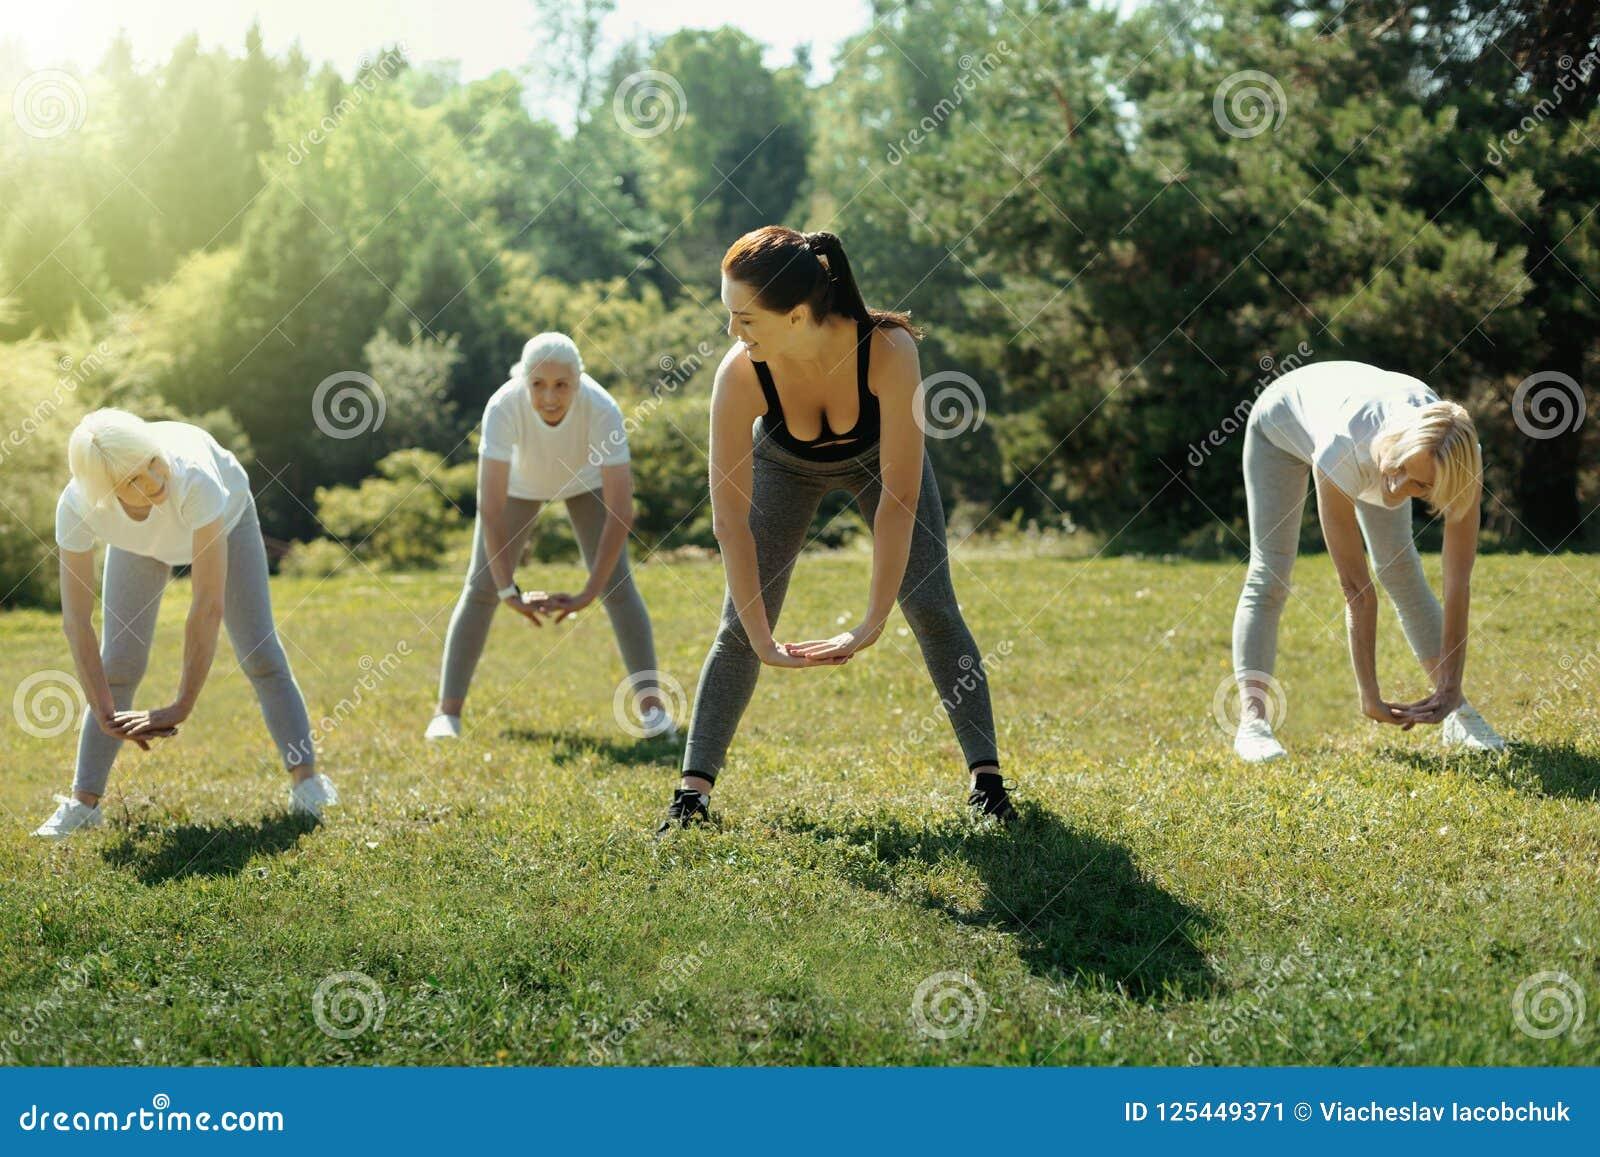 Elderly ladies stretching backs during group workout